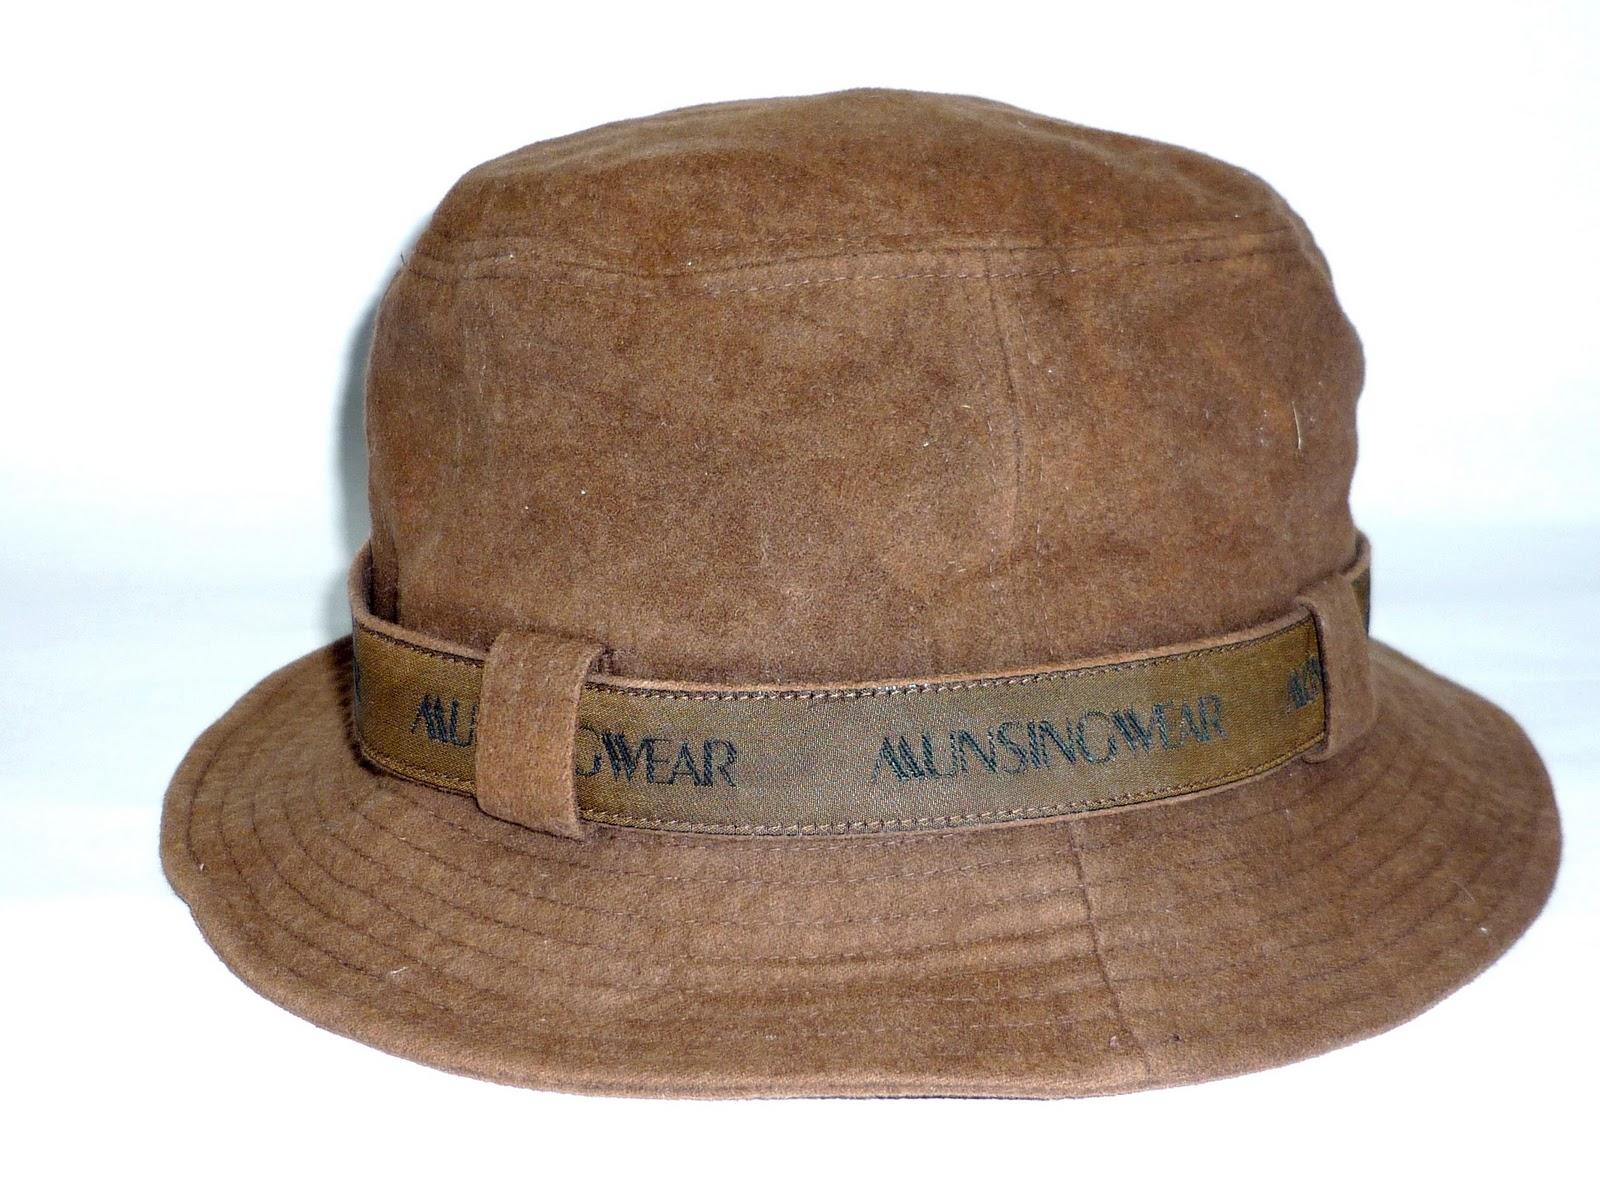 Rchybundle edisi topi topi polo rl yamaha barreta hat dll for Polo fishing hat